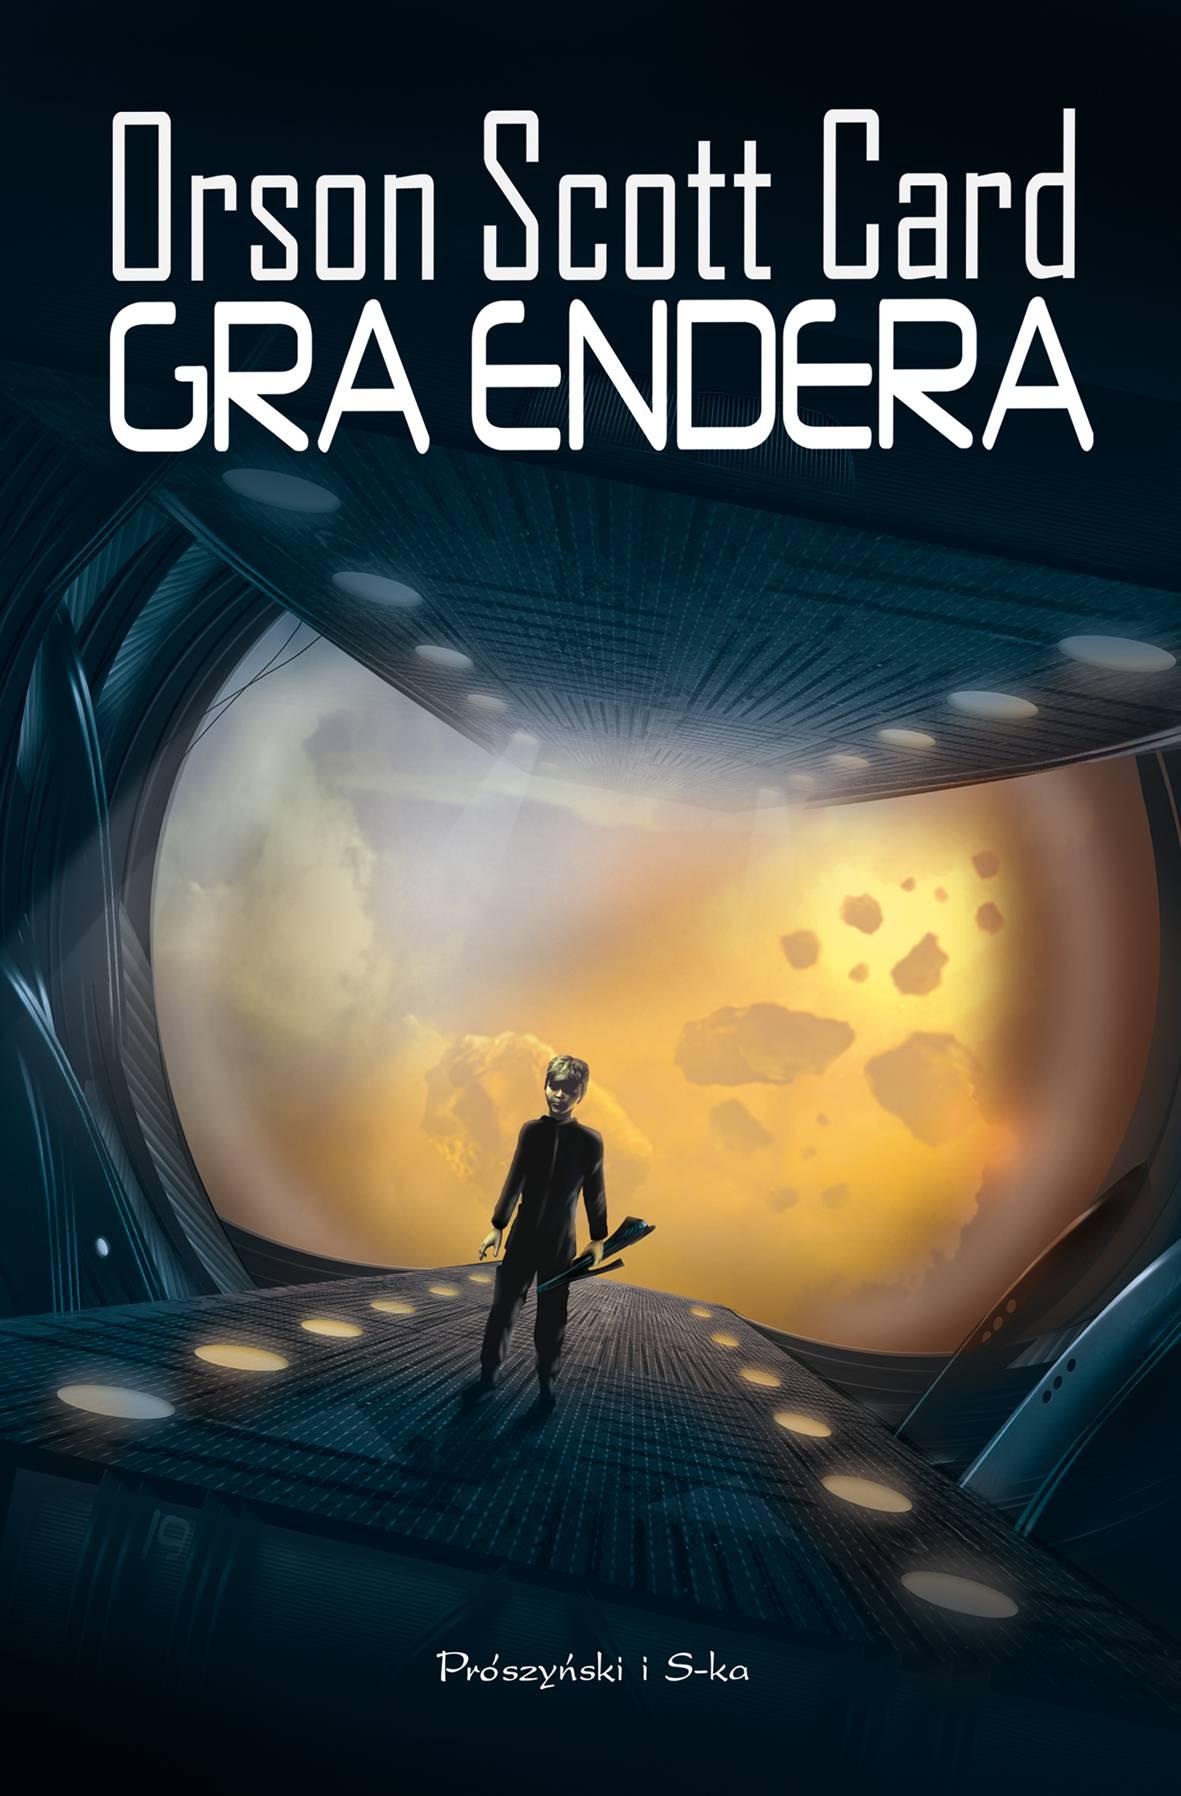 Gra Endera - Ebook (Książka EPUB) do pobrania w formacie EPUB